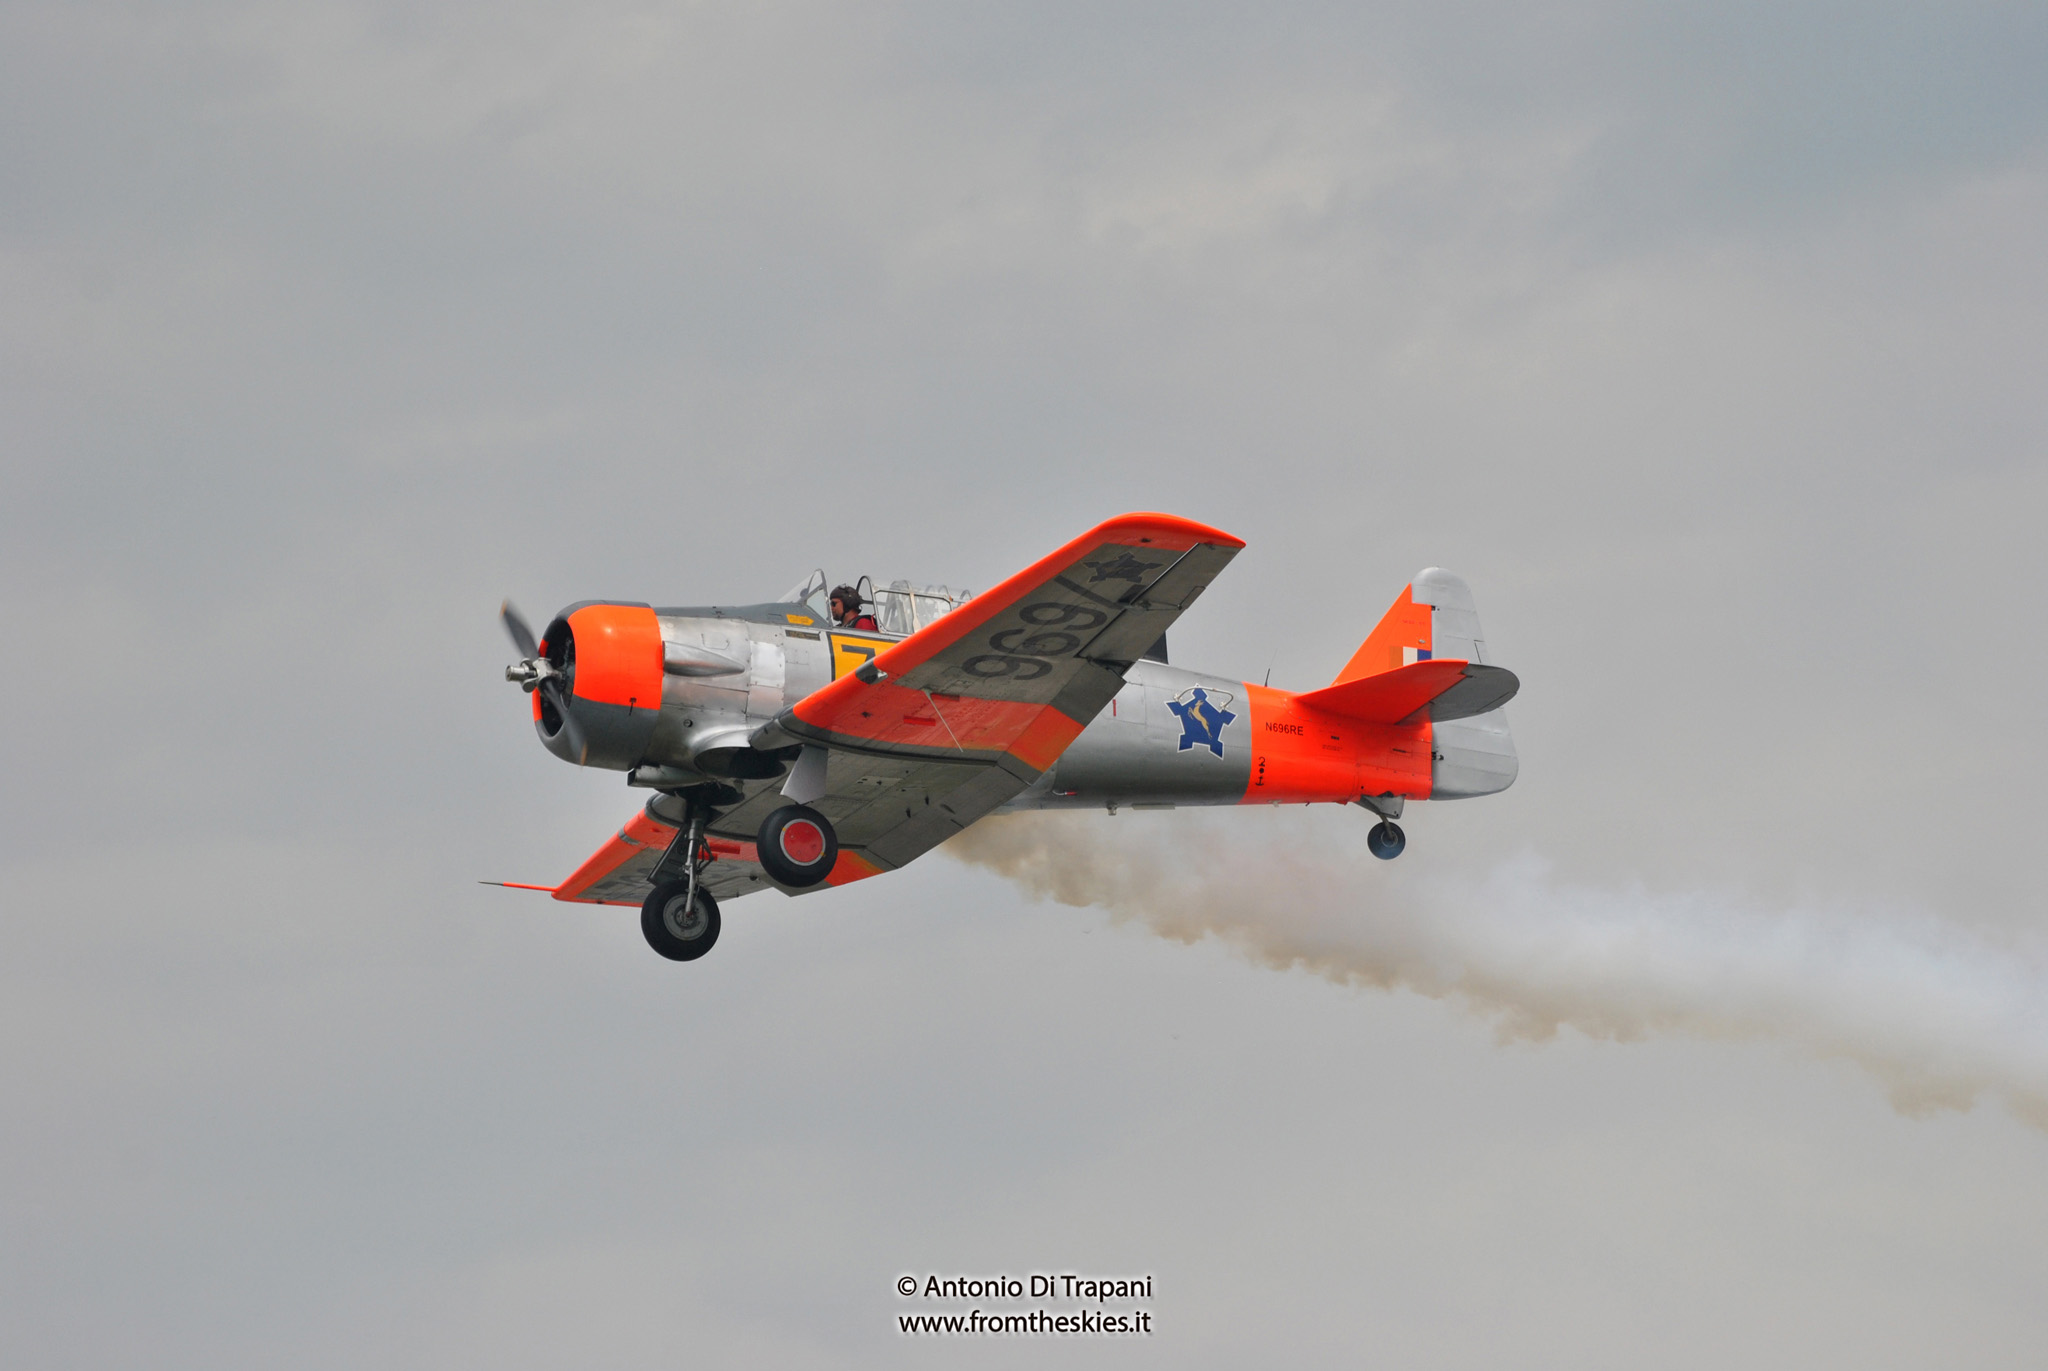 T6 Harvard SAAF - Pardubice Air Show 2016 (8)